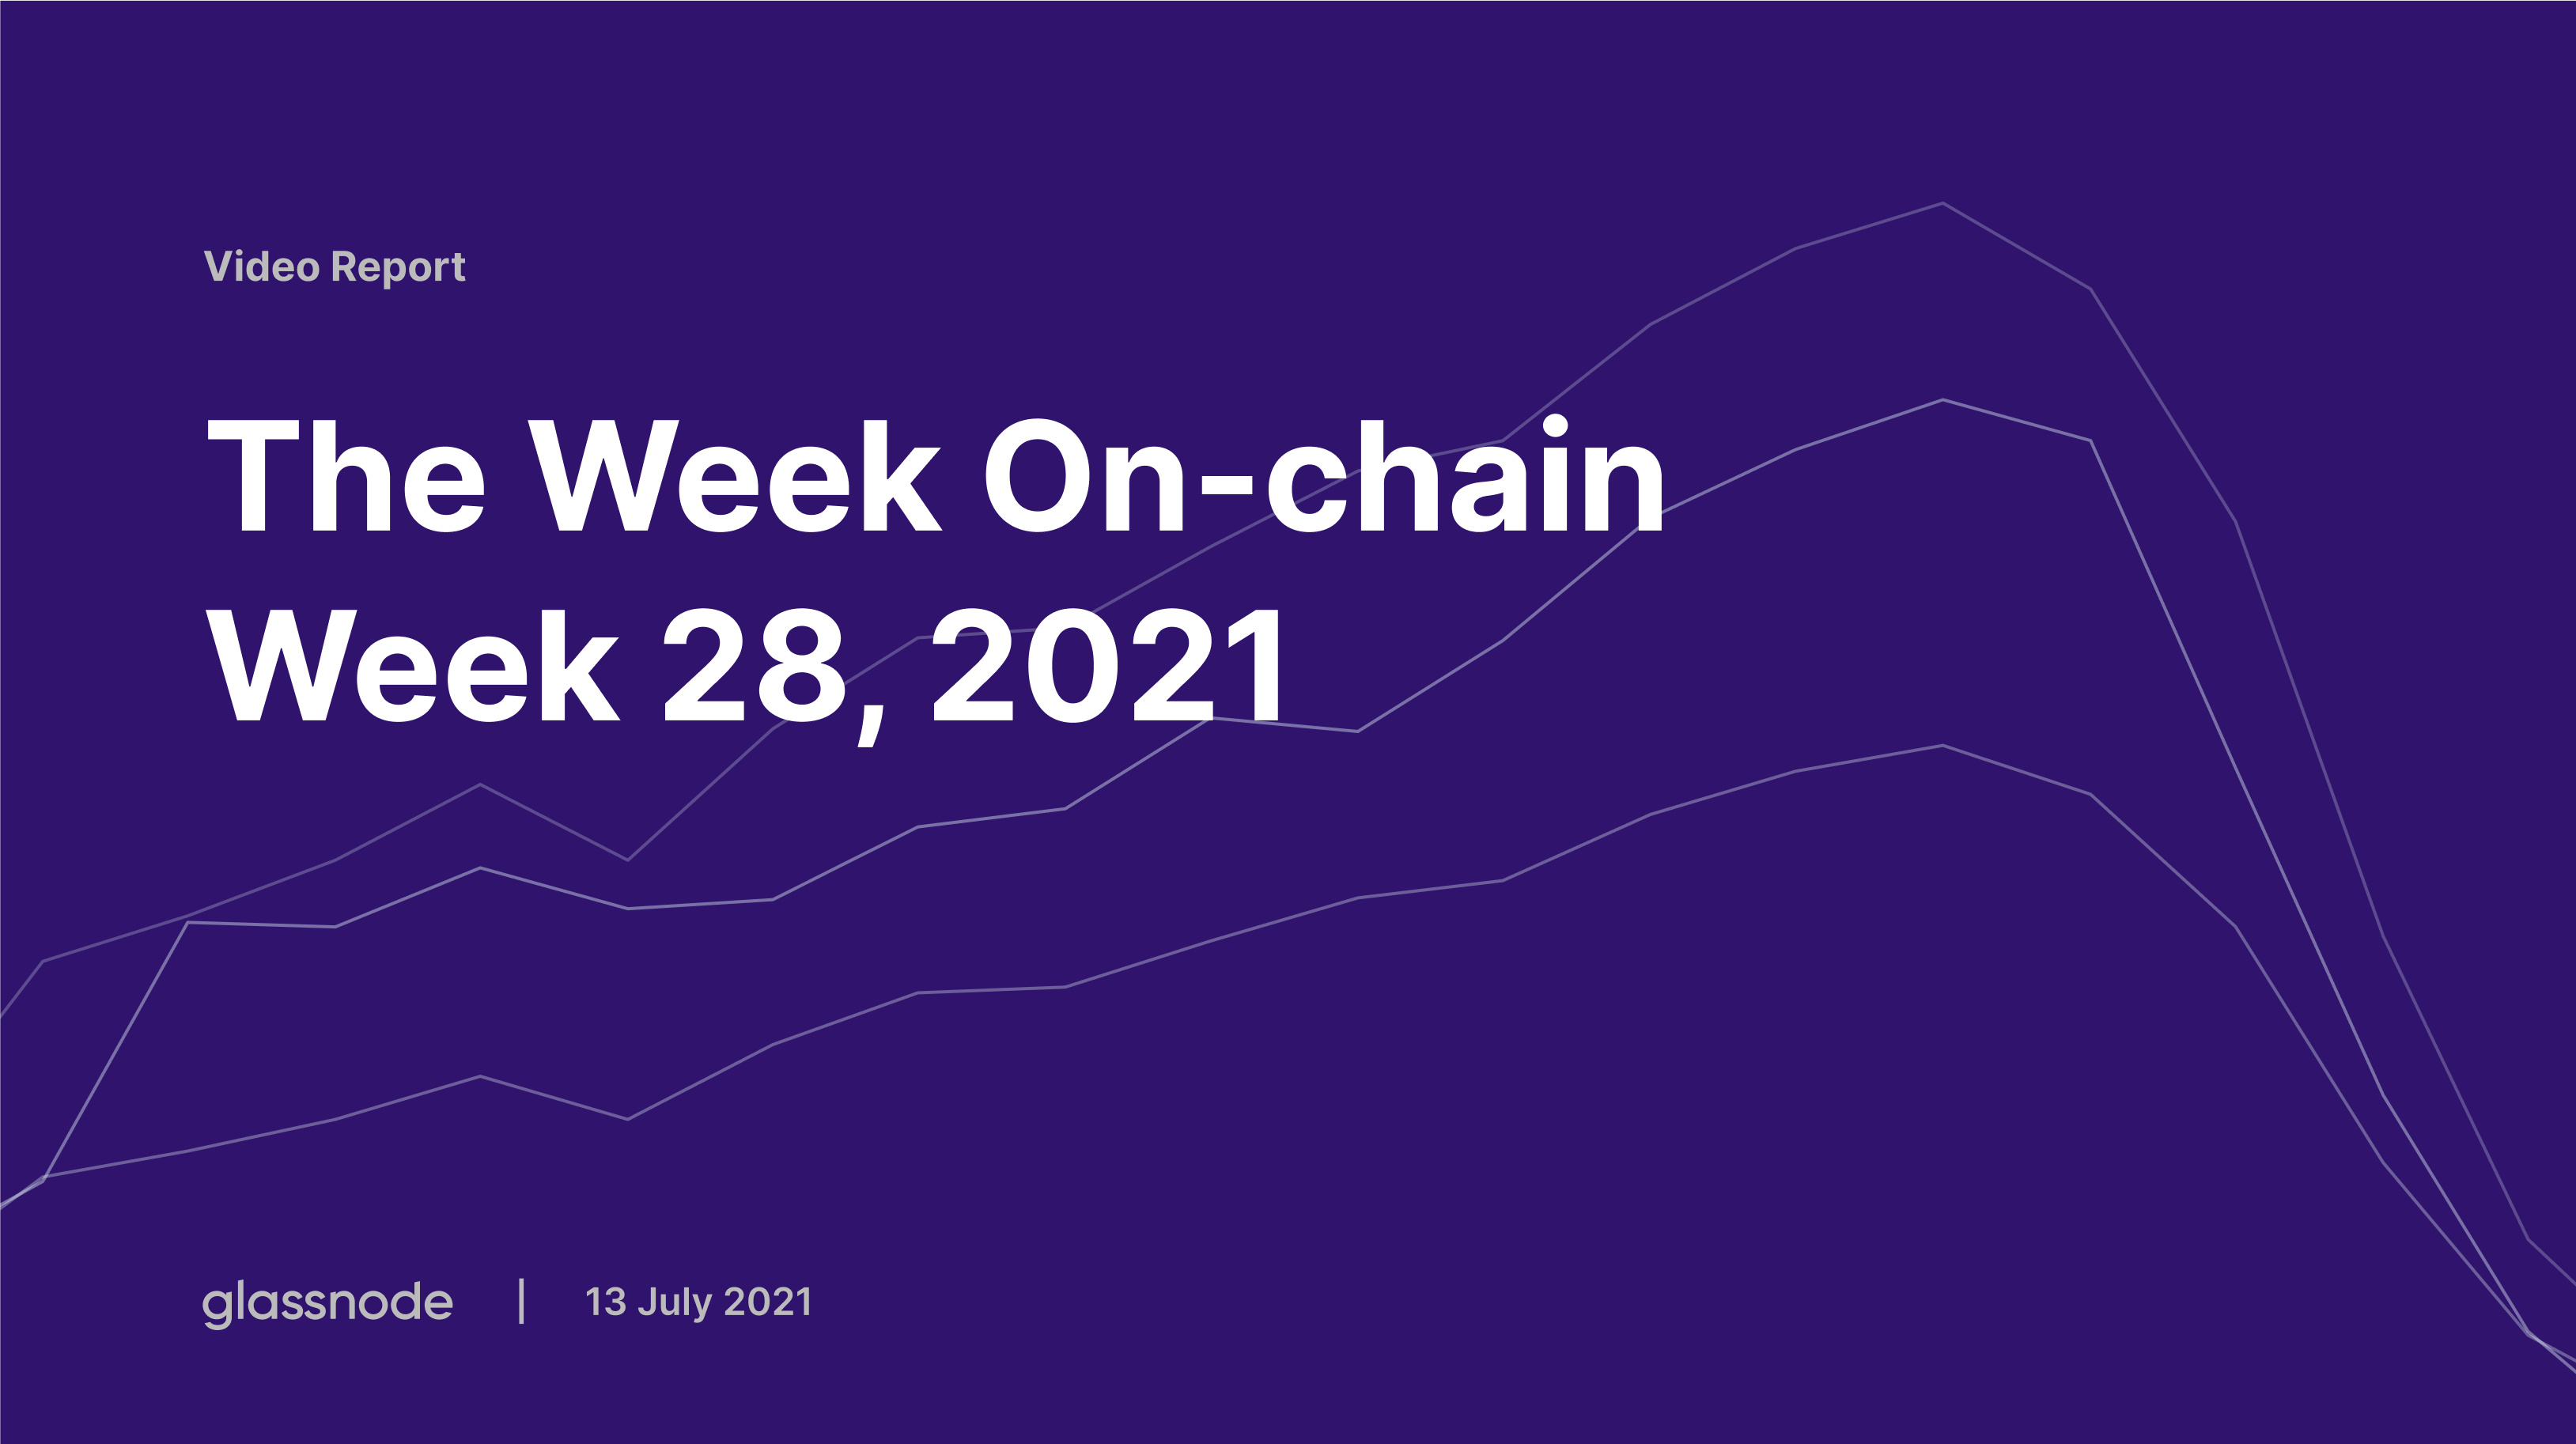 The Week on-chain (Week 29, 2021)